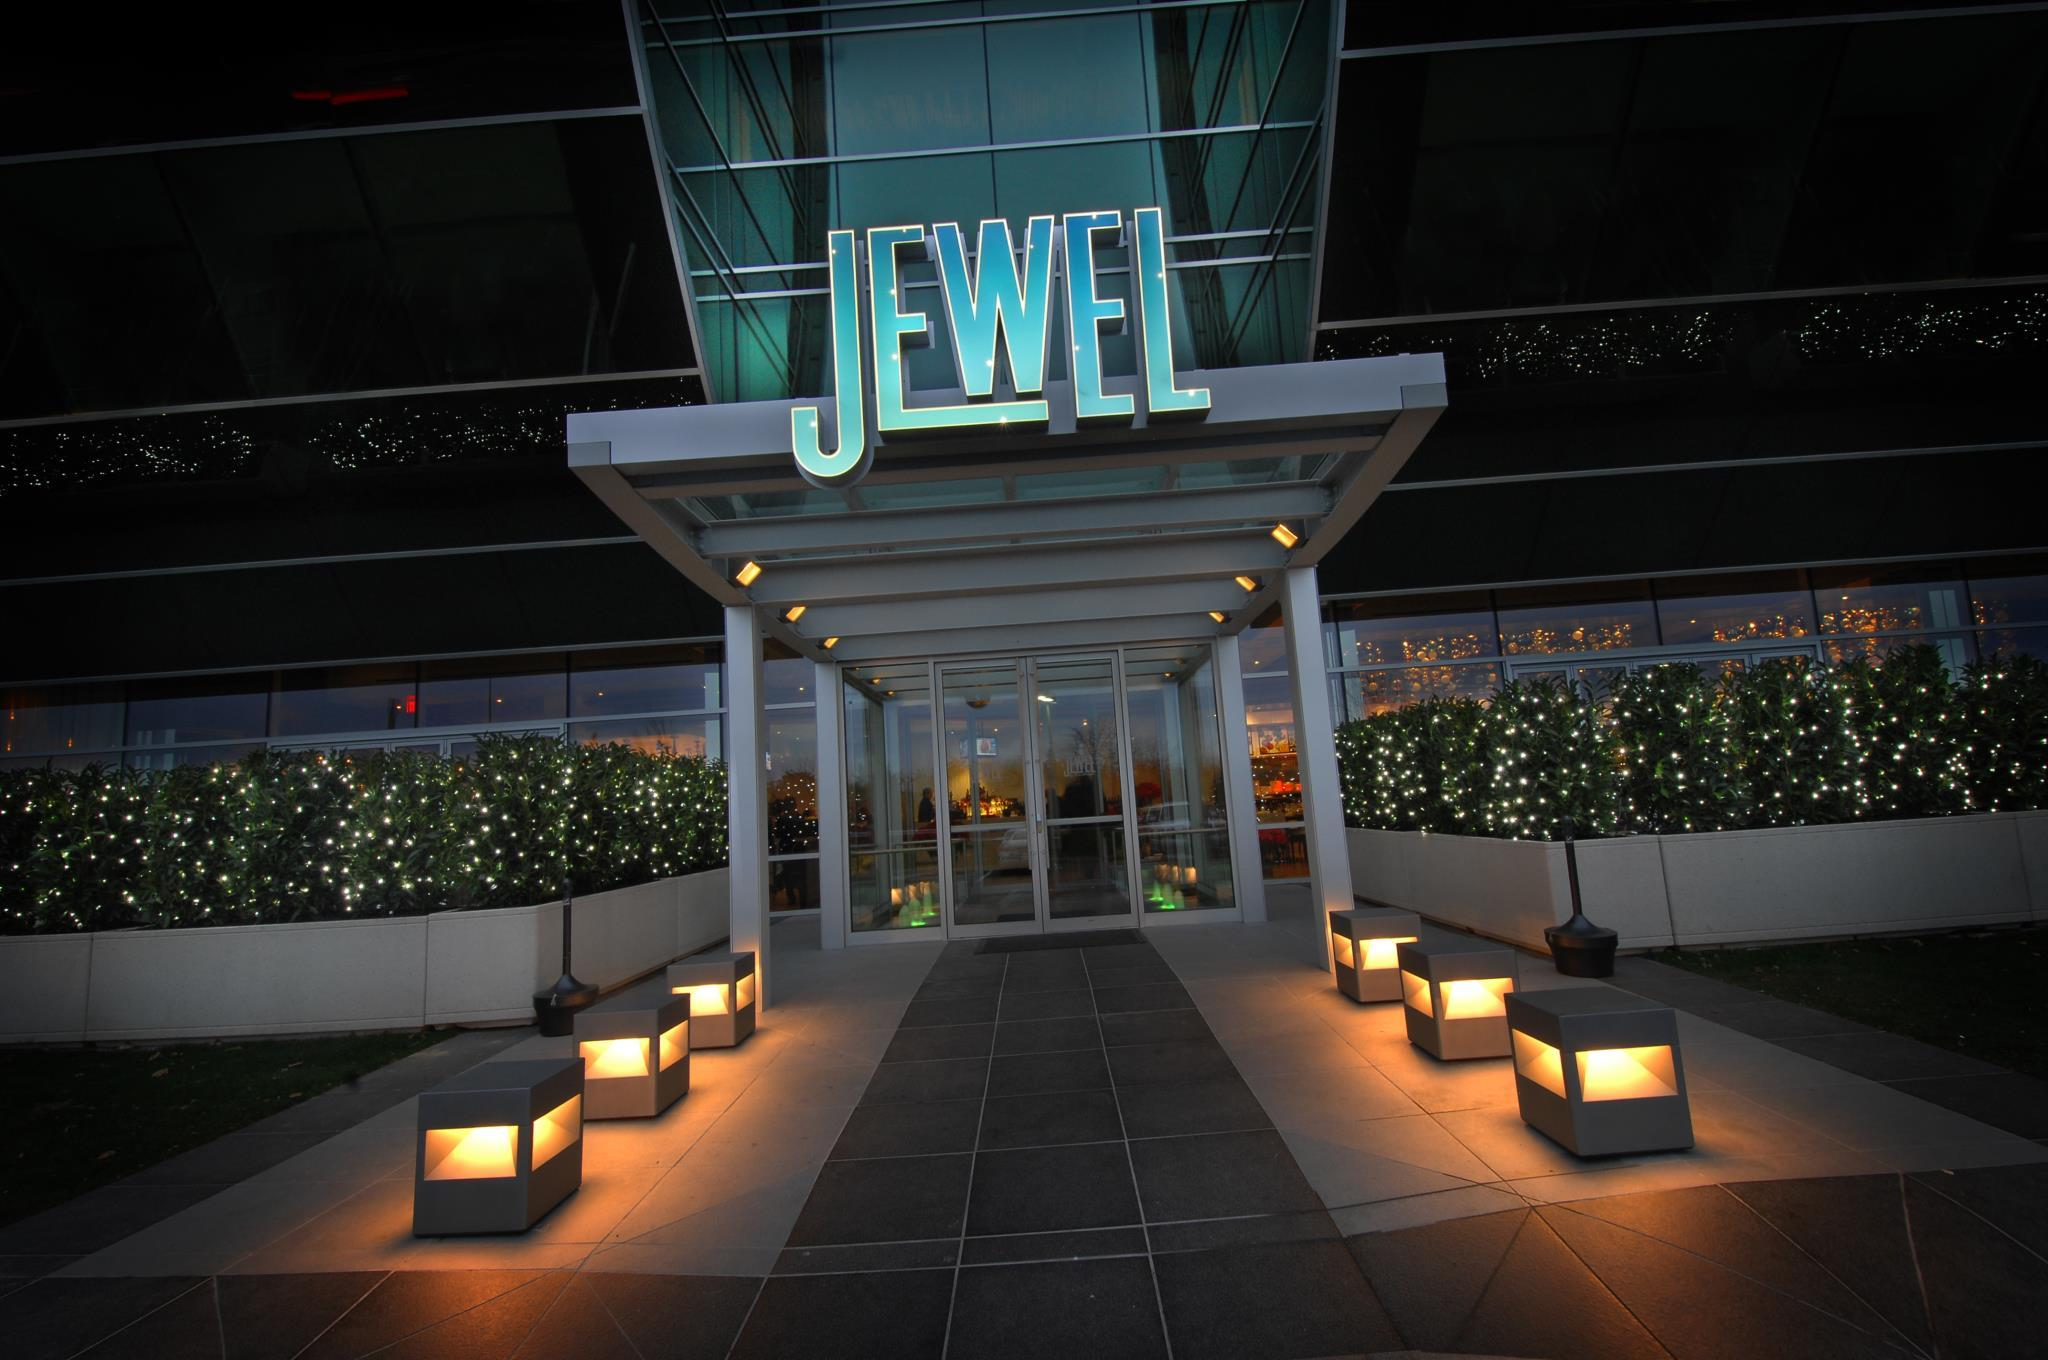 Photo at Jewel by Tom Schaudel